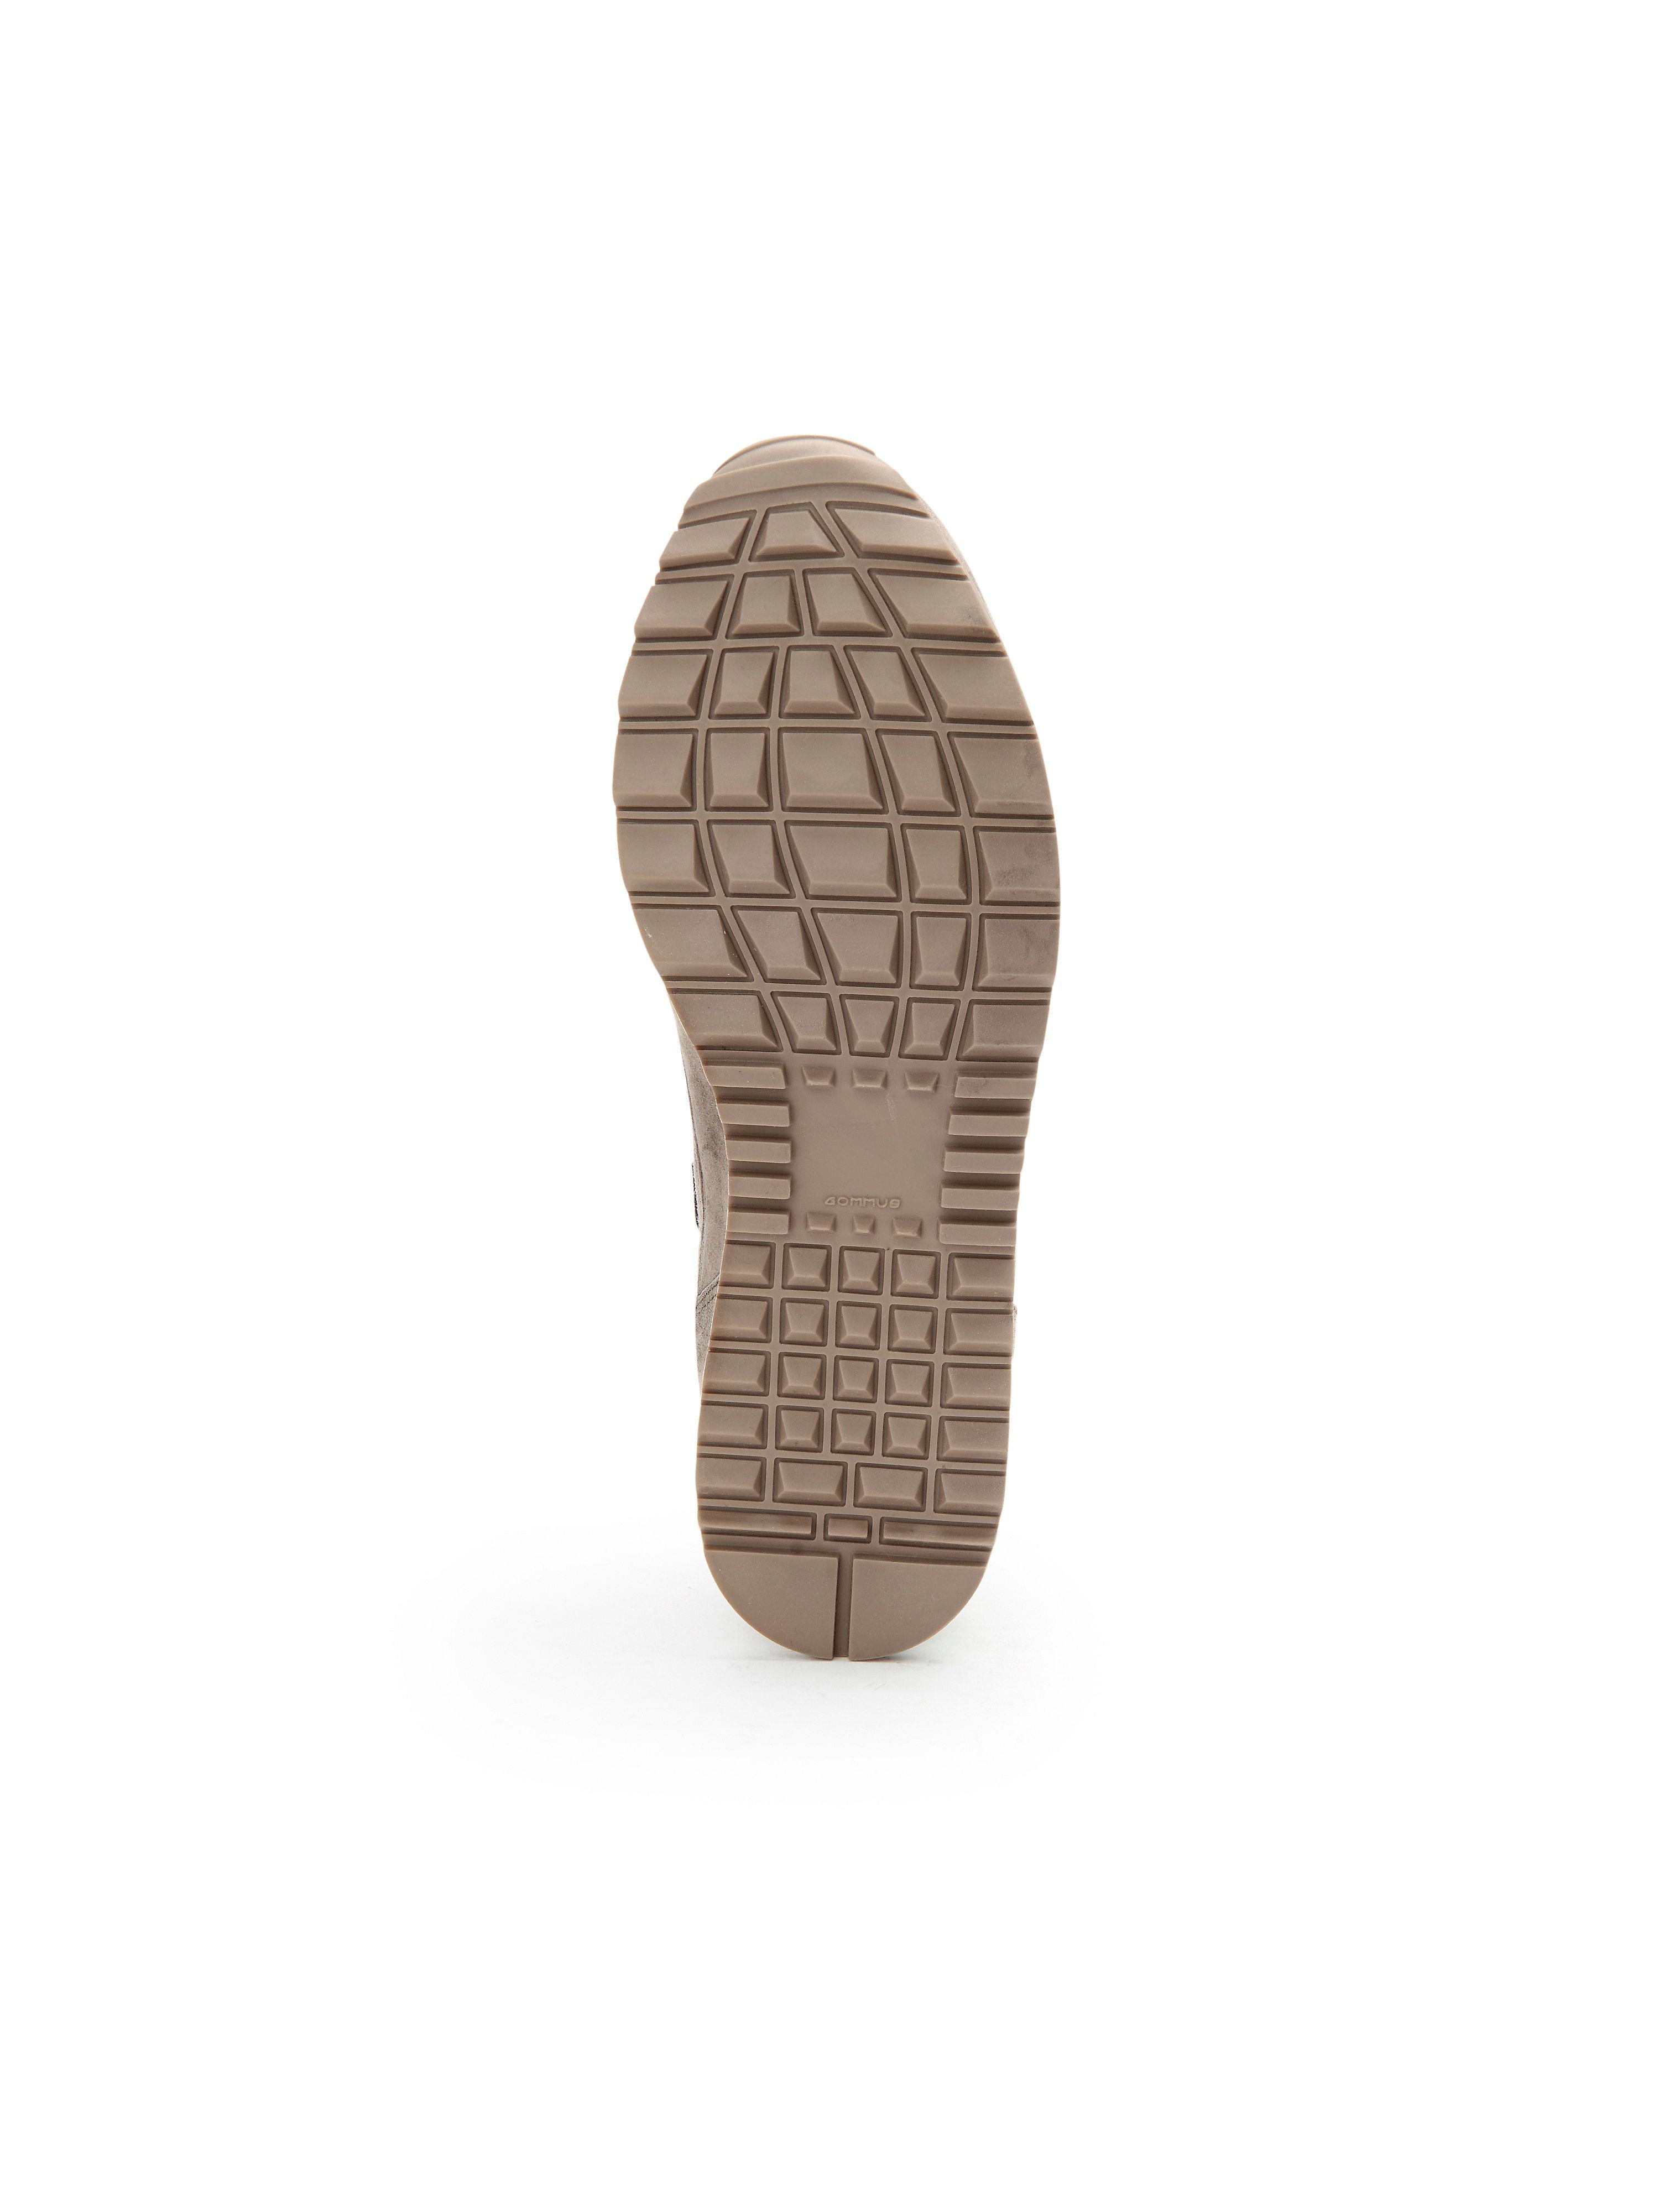 Hassia aus - Sneaker Barcelona H aus Hassia 100% Leder - Taupe Gute Qualität beliebte Schuhe c2b62b